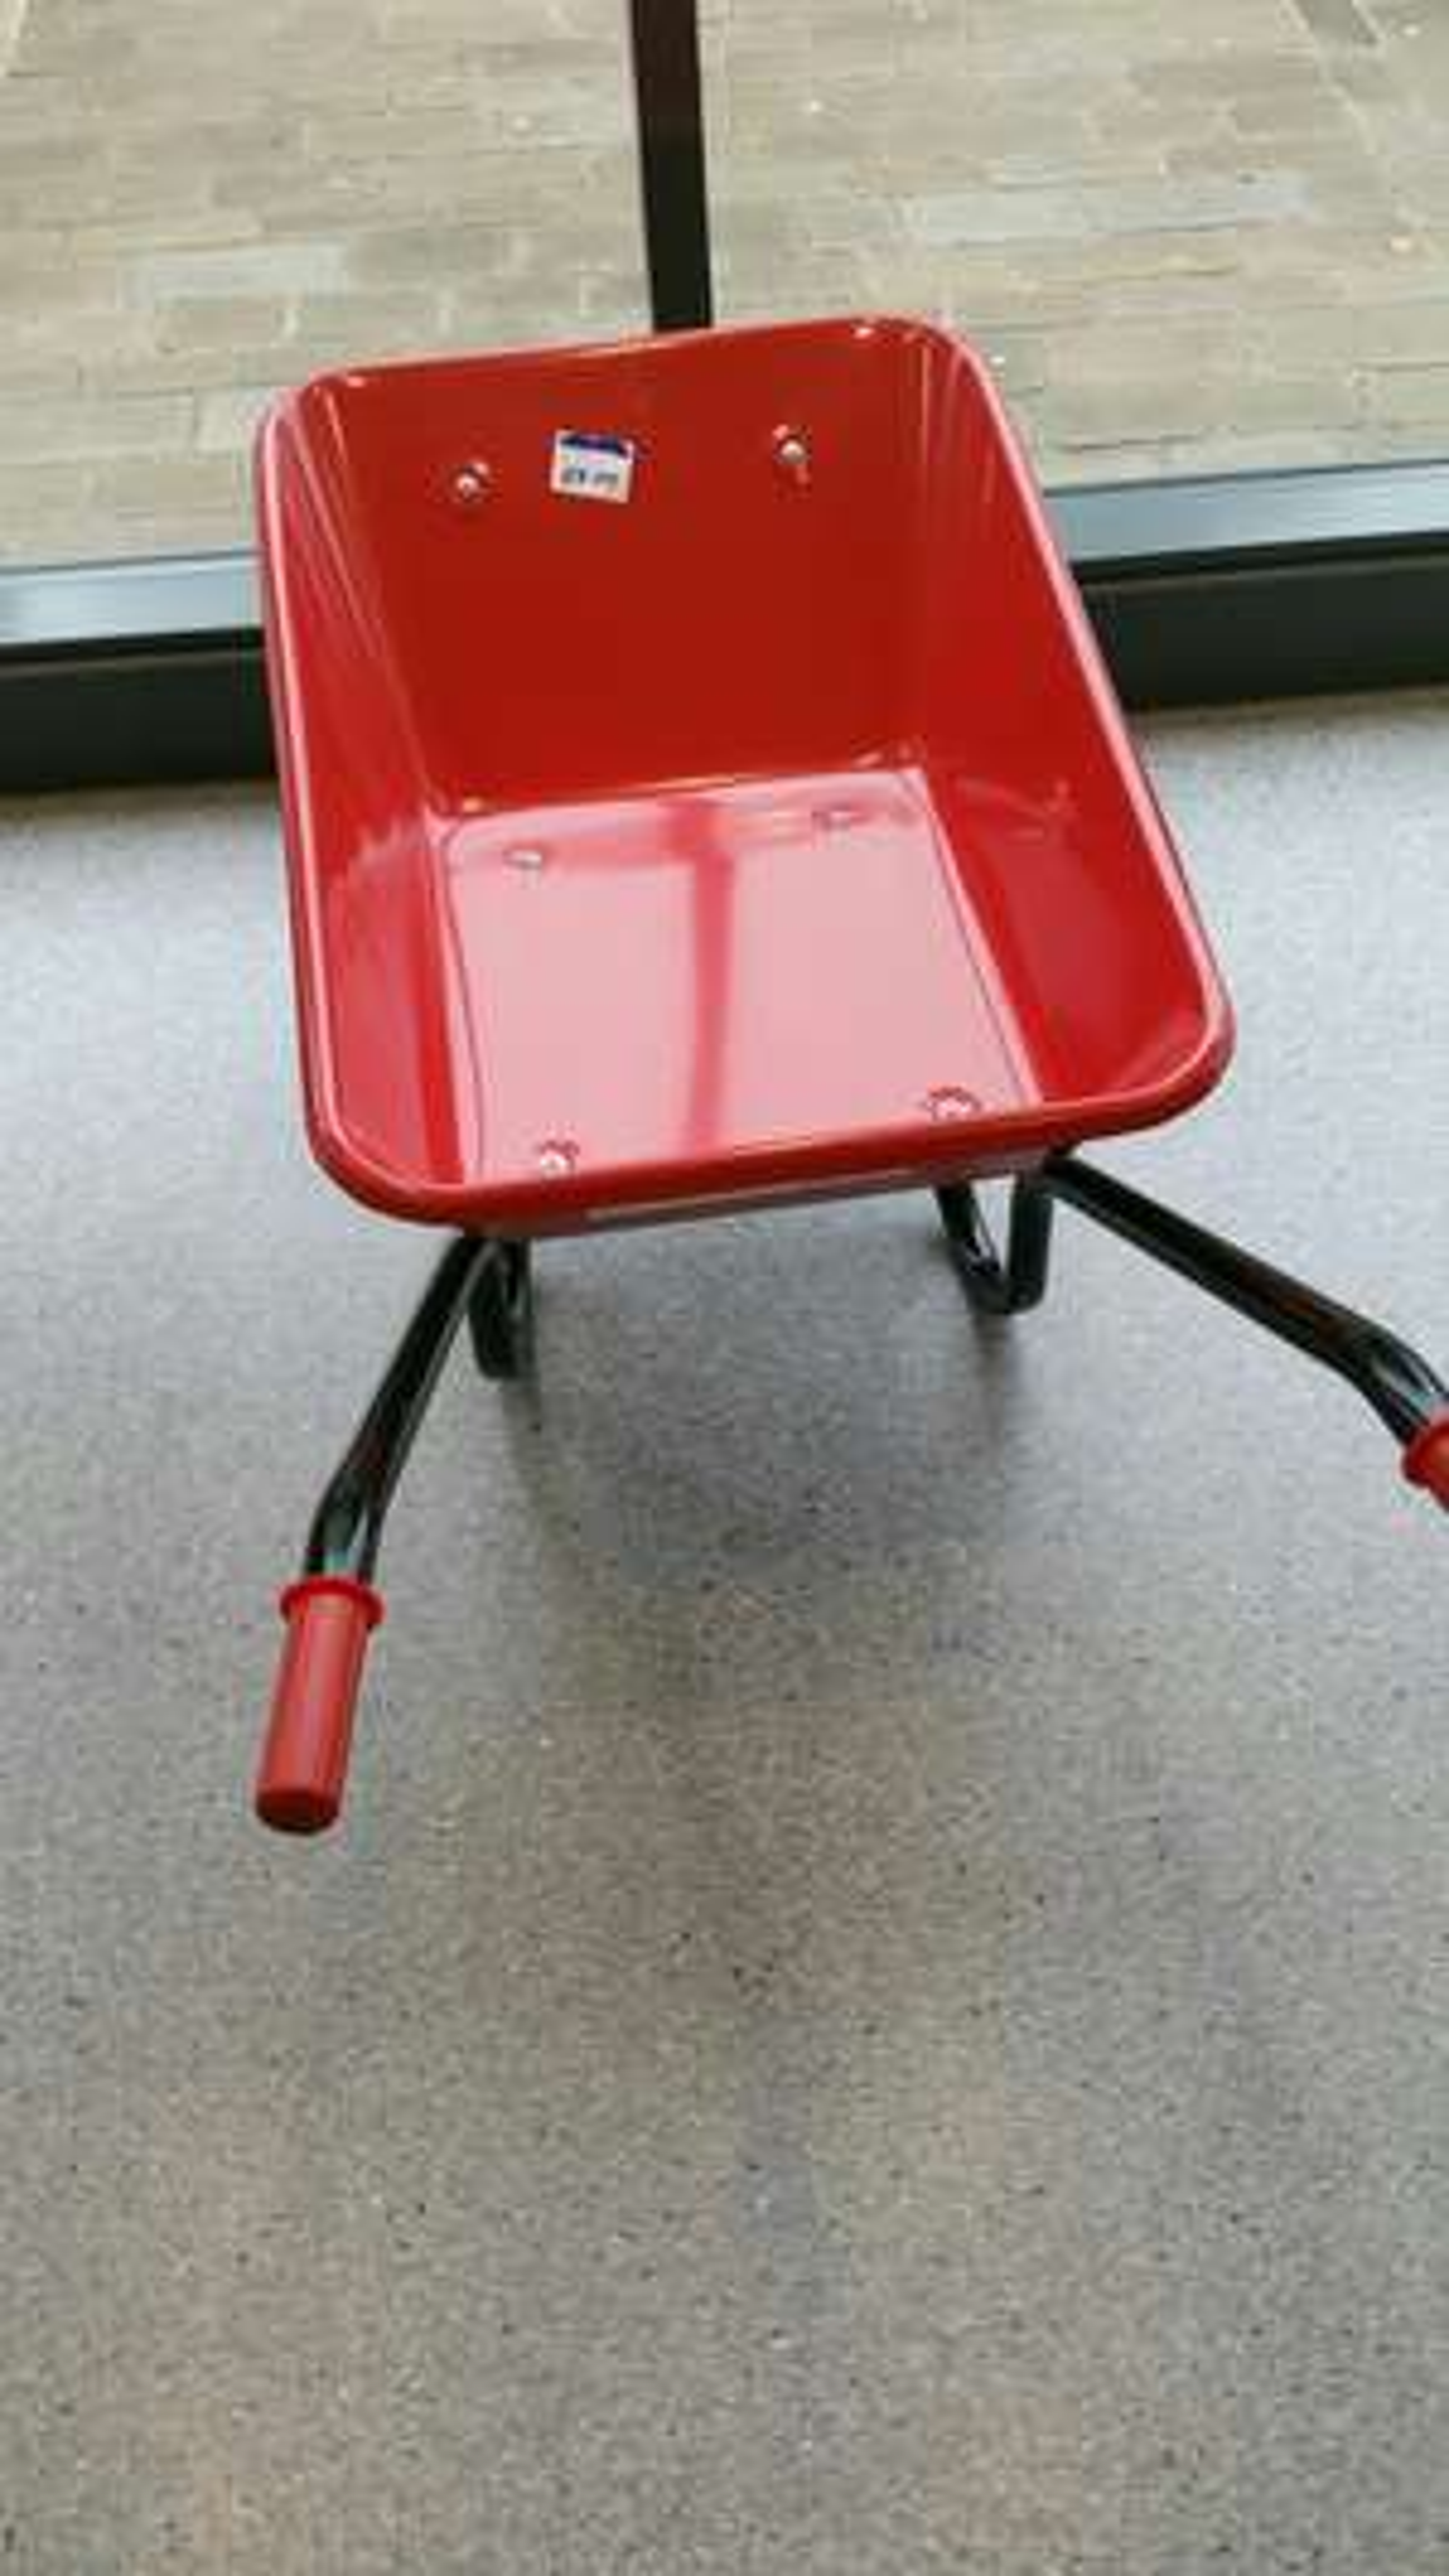 Red Metal Wheelbarrow £8 at Wilko (Blackburn) instore